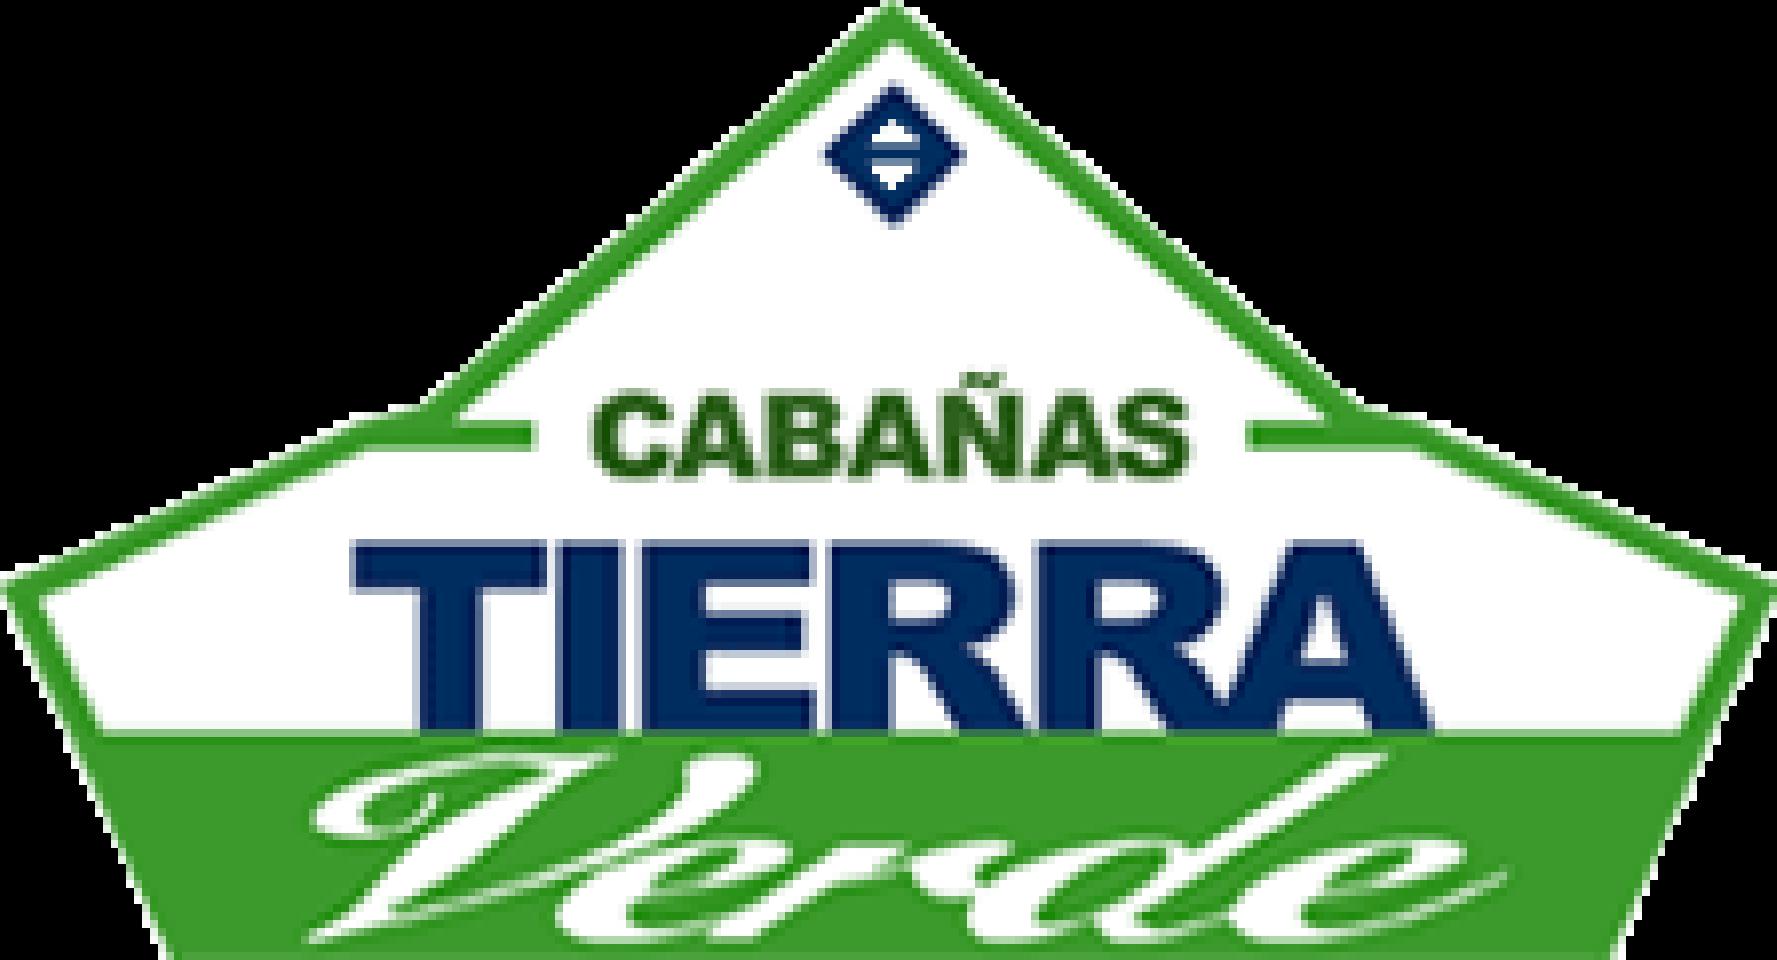 Tierra Verde Carelmapu